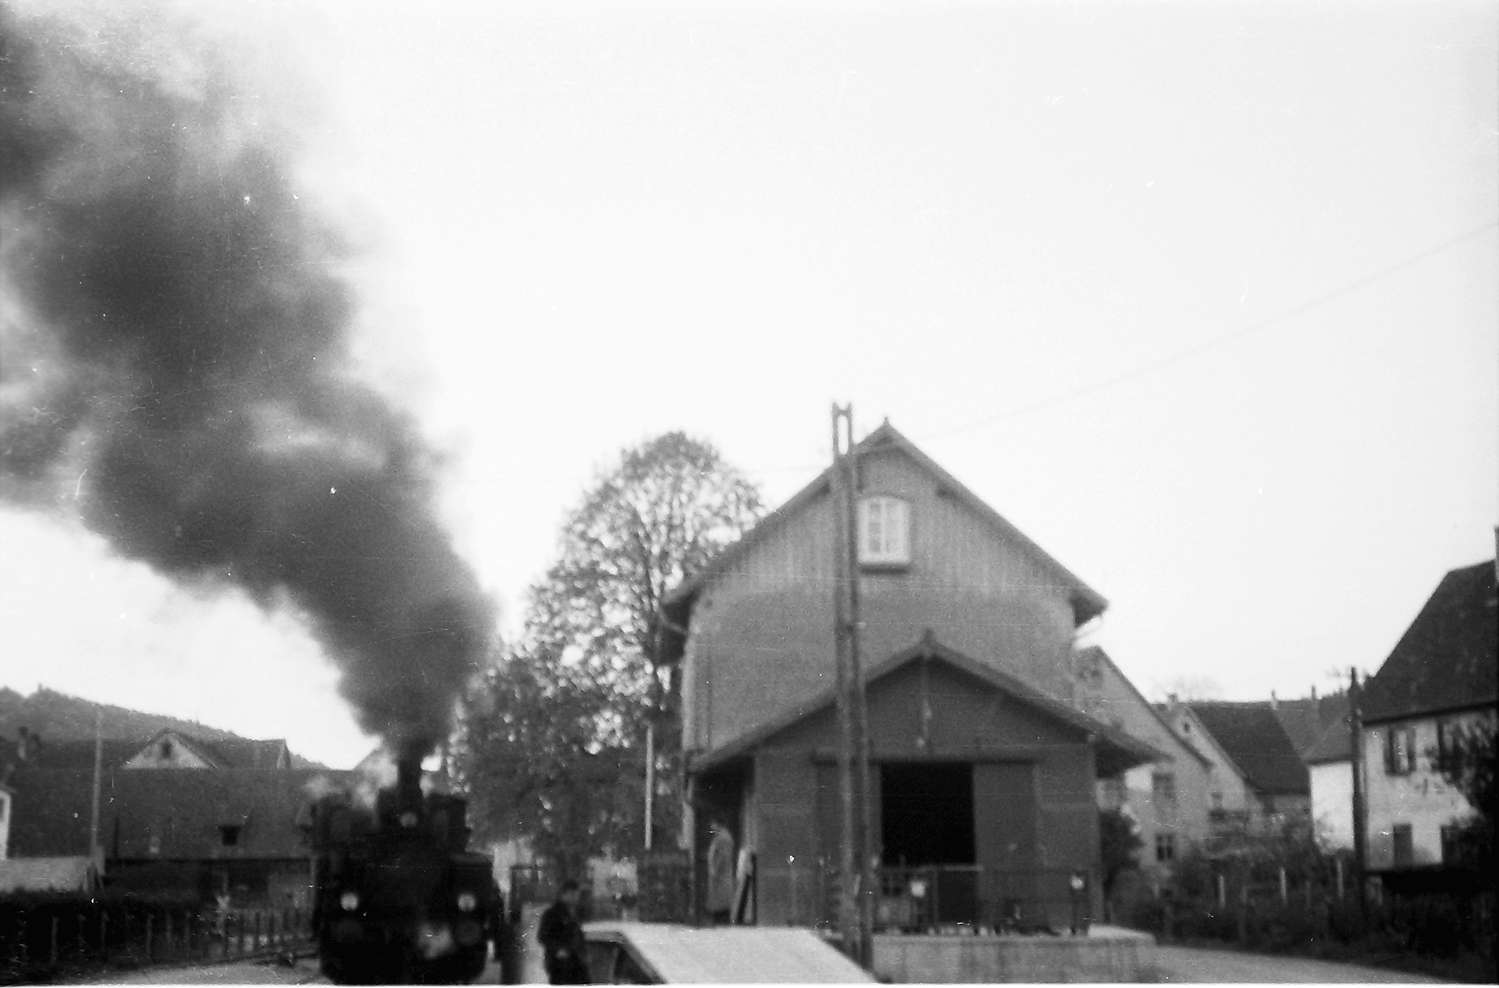 Lok 12, 54/55, Rangieren am Trochtelfinger Lagerhaus (Bahnhof), rechts Haus am Karrenweg (Abbruch 1986), Bahnagent war Herr Kabel, der Güterschuppen wurde zur Garage umgebaut, Bild 1